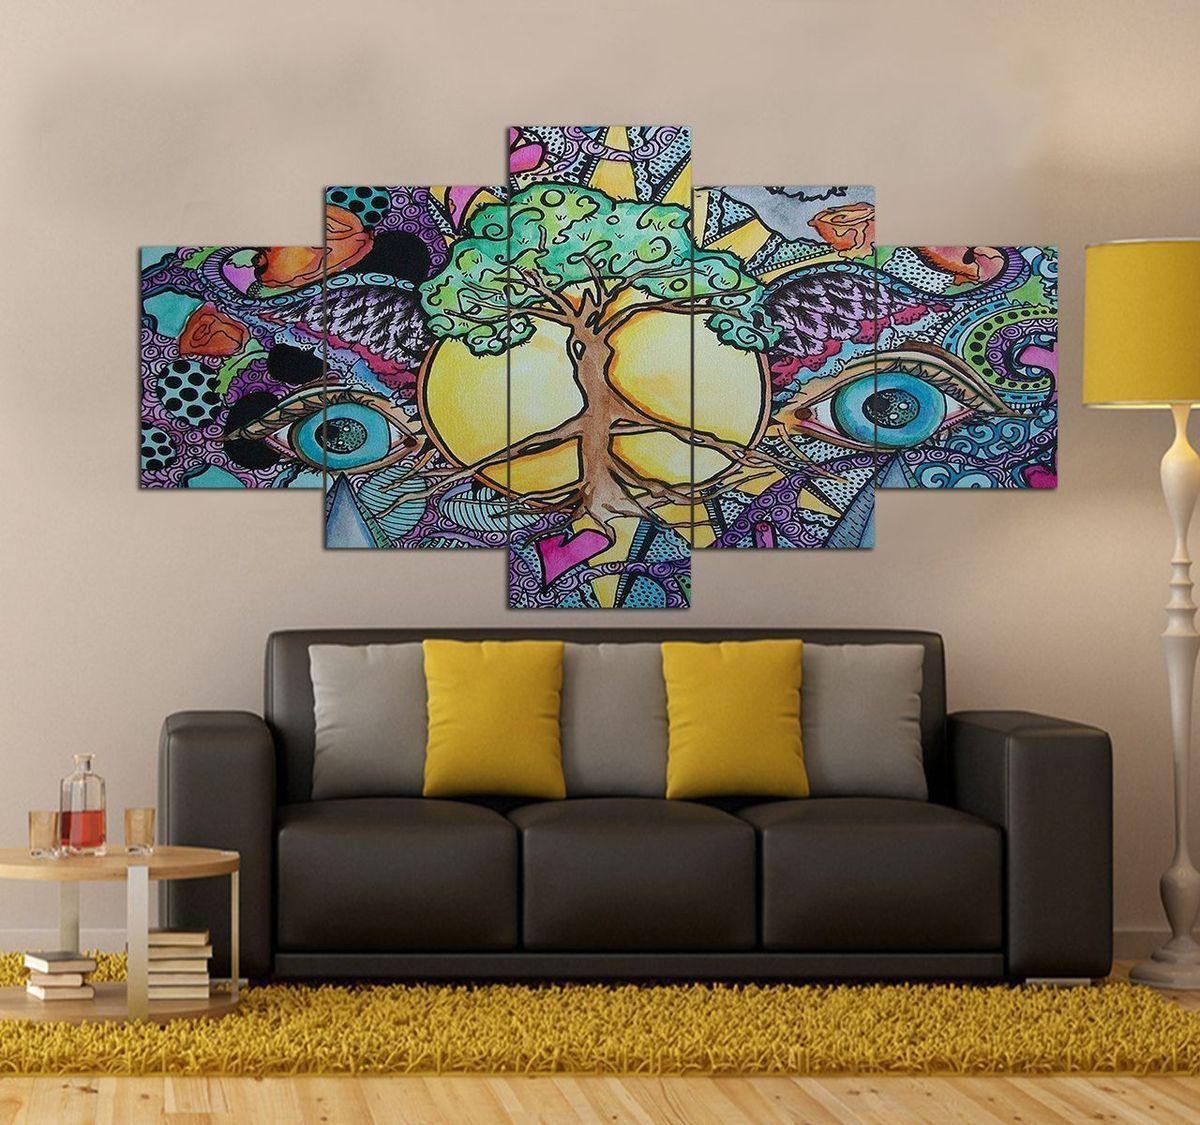 Peace Hippie Canvas Wall Art Set Decor 5 Piece Canvas Art Prints H Canvas Art Wall Decor Canvas Wall Art Set 5 Piece Canvas Art